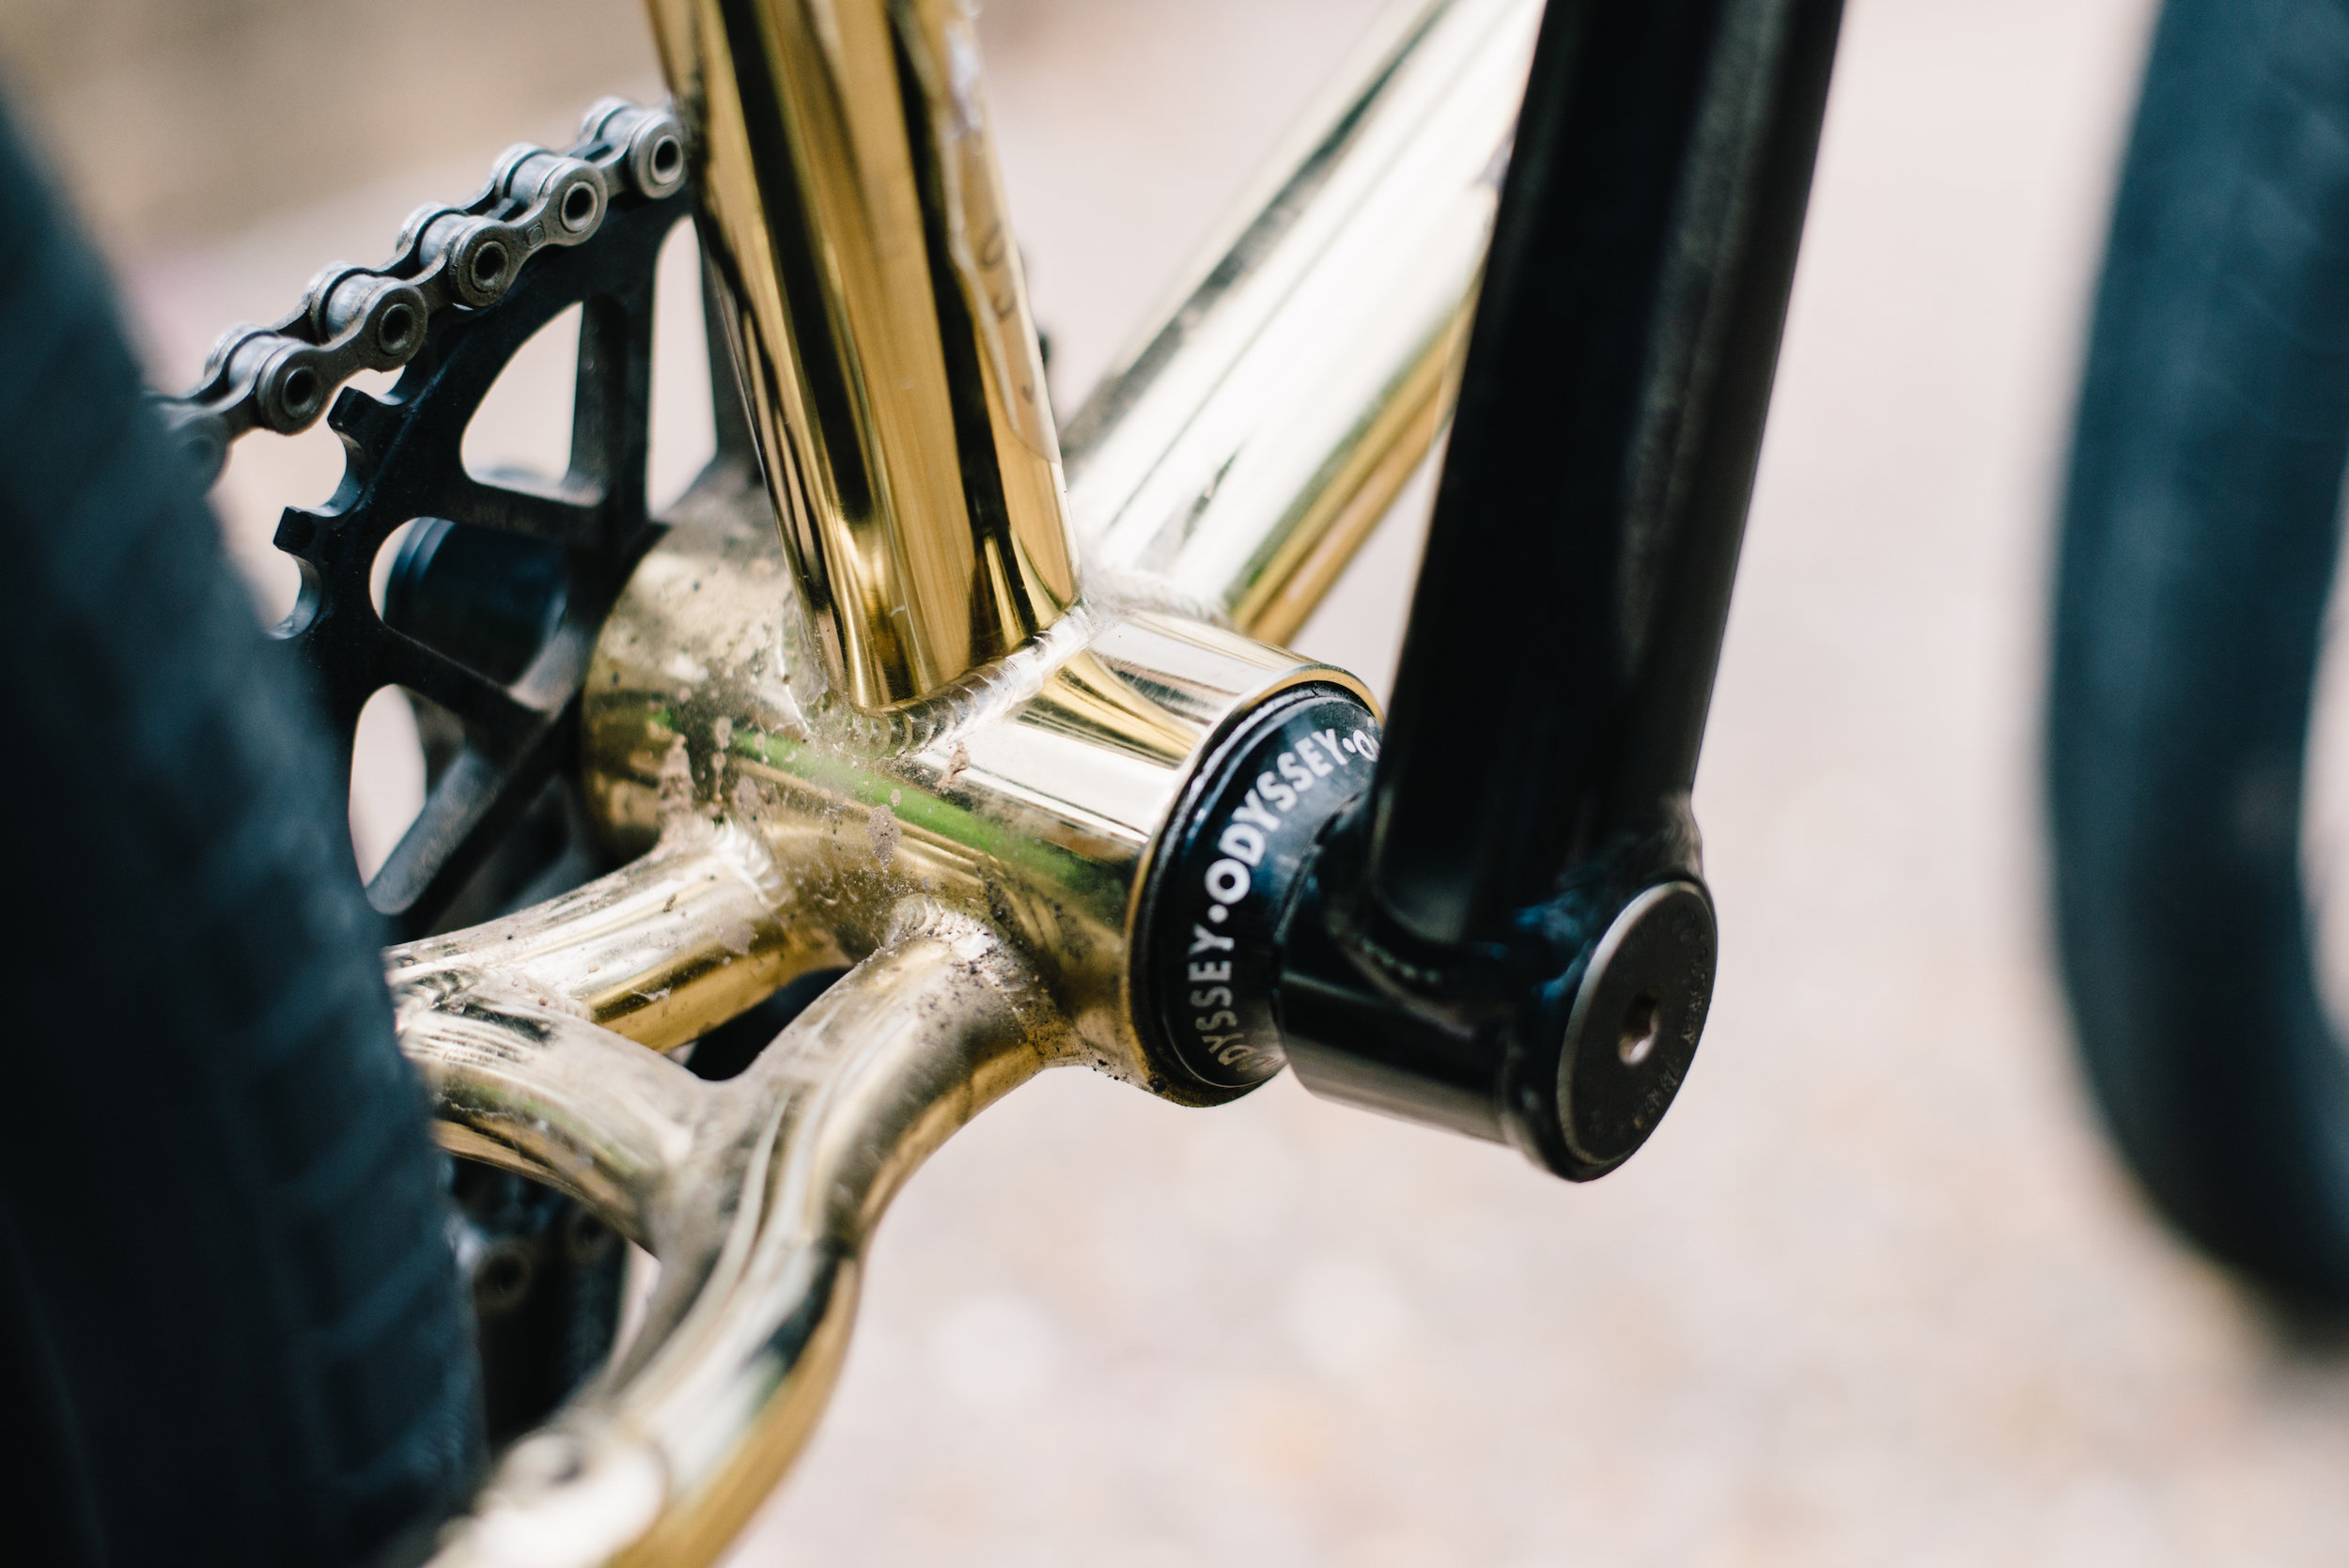 181128 Austin Brunger bike check KIRBY HALF RES_14.jpg